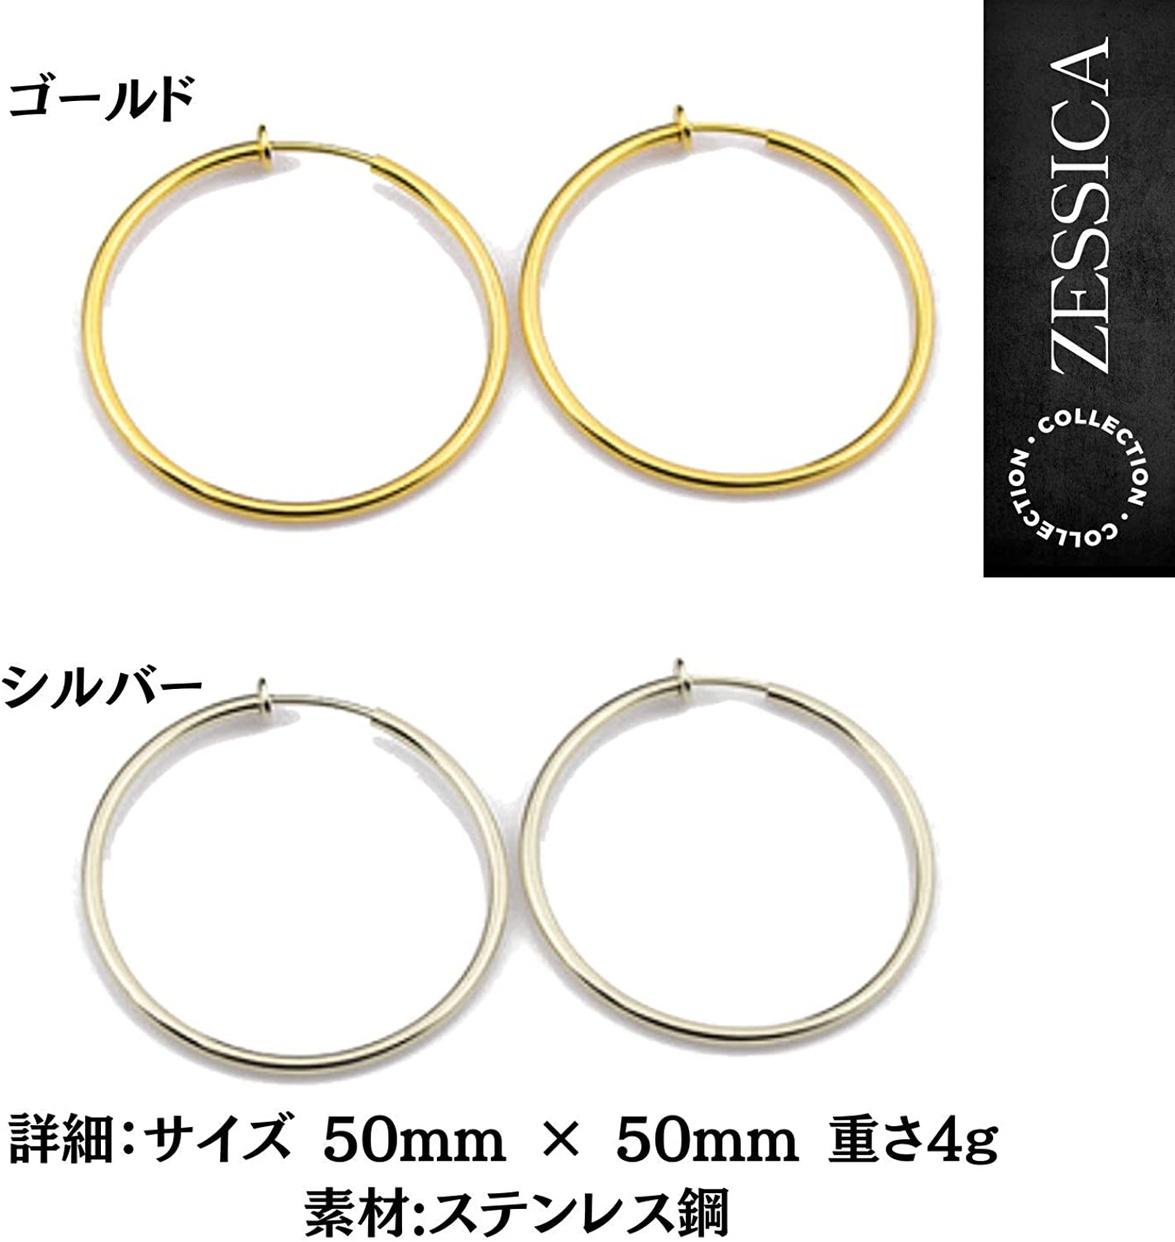 ZESSICA(ゼシカ) イヤリング マデュアシリーズの商品画像5